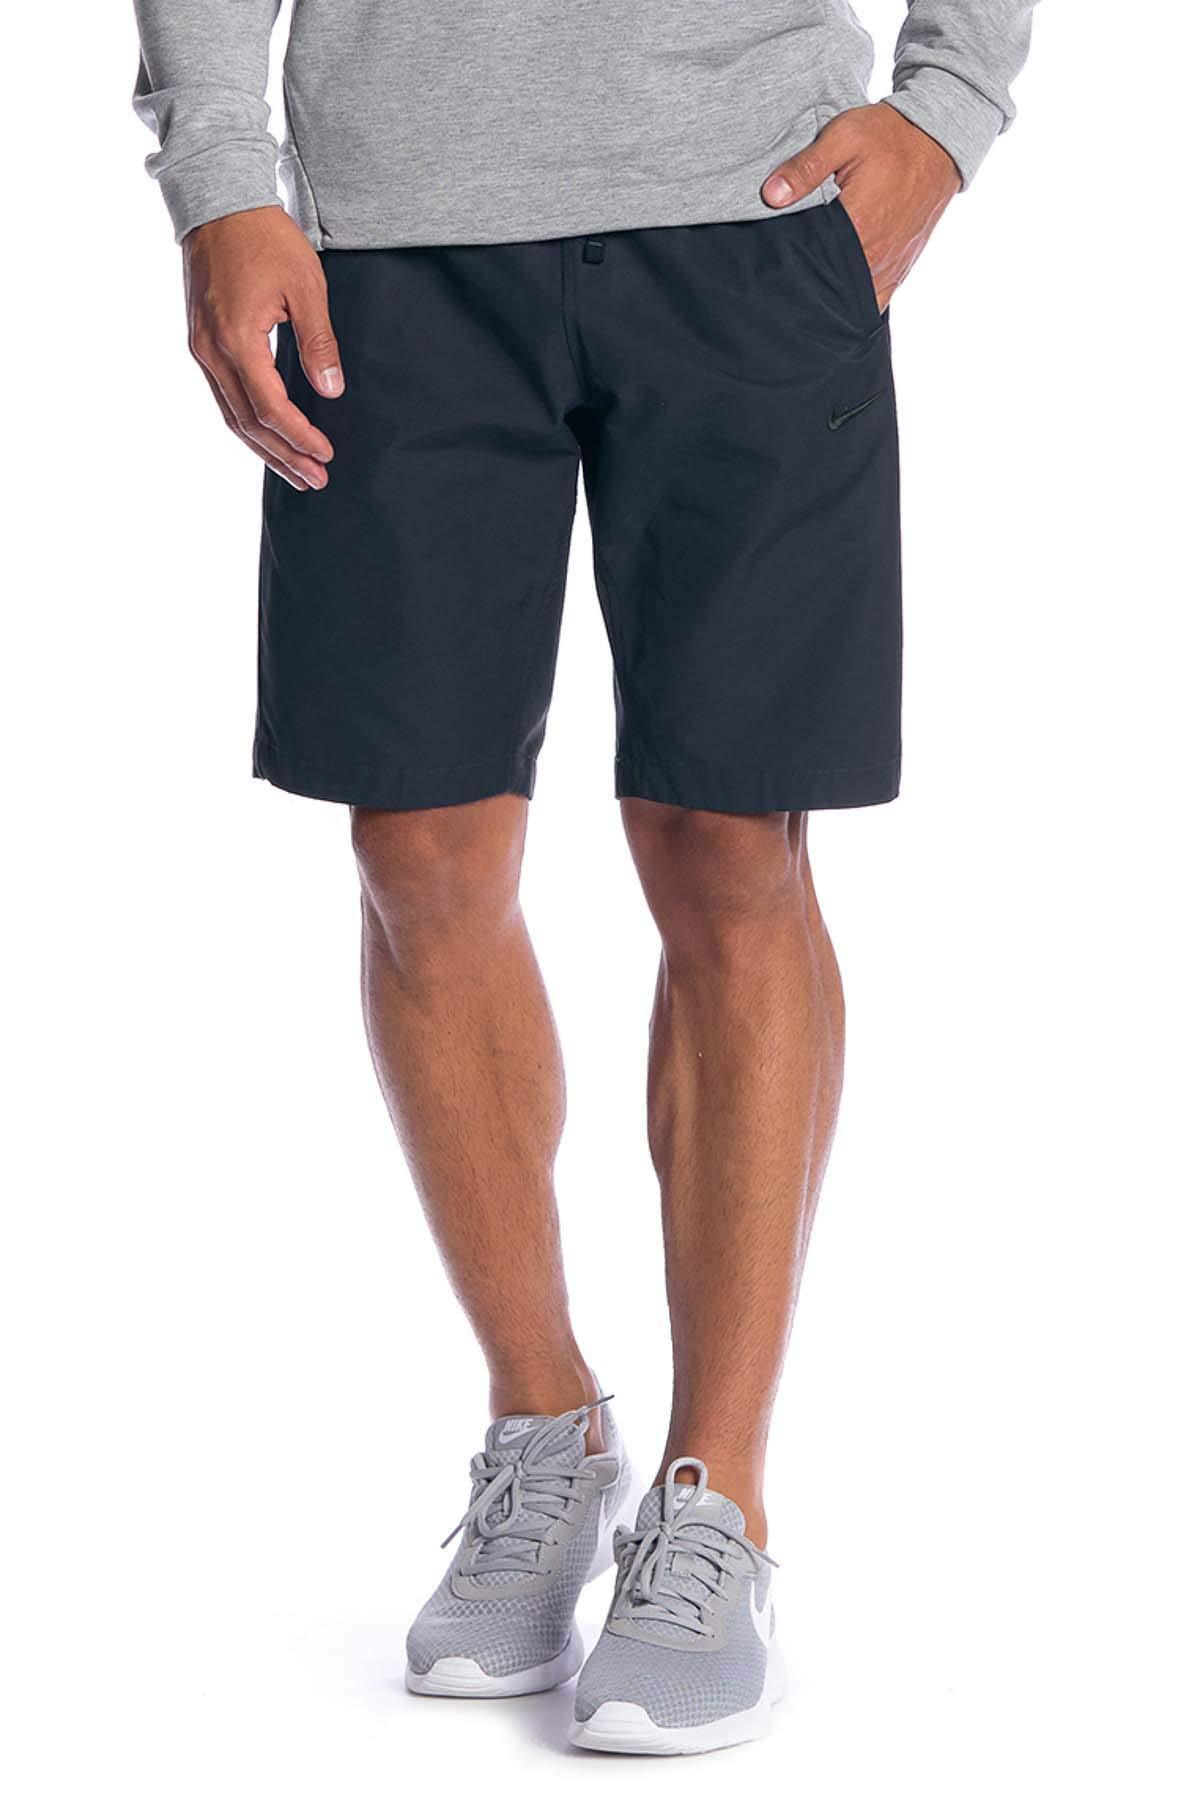 Nike Men's Sportswear Woven Players Shorts-Navy-Large by Nike